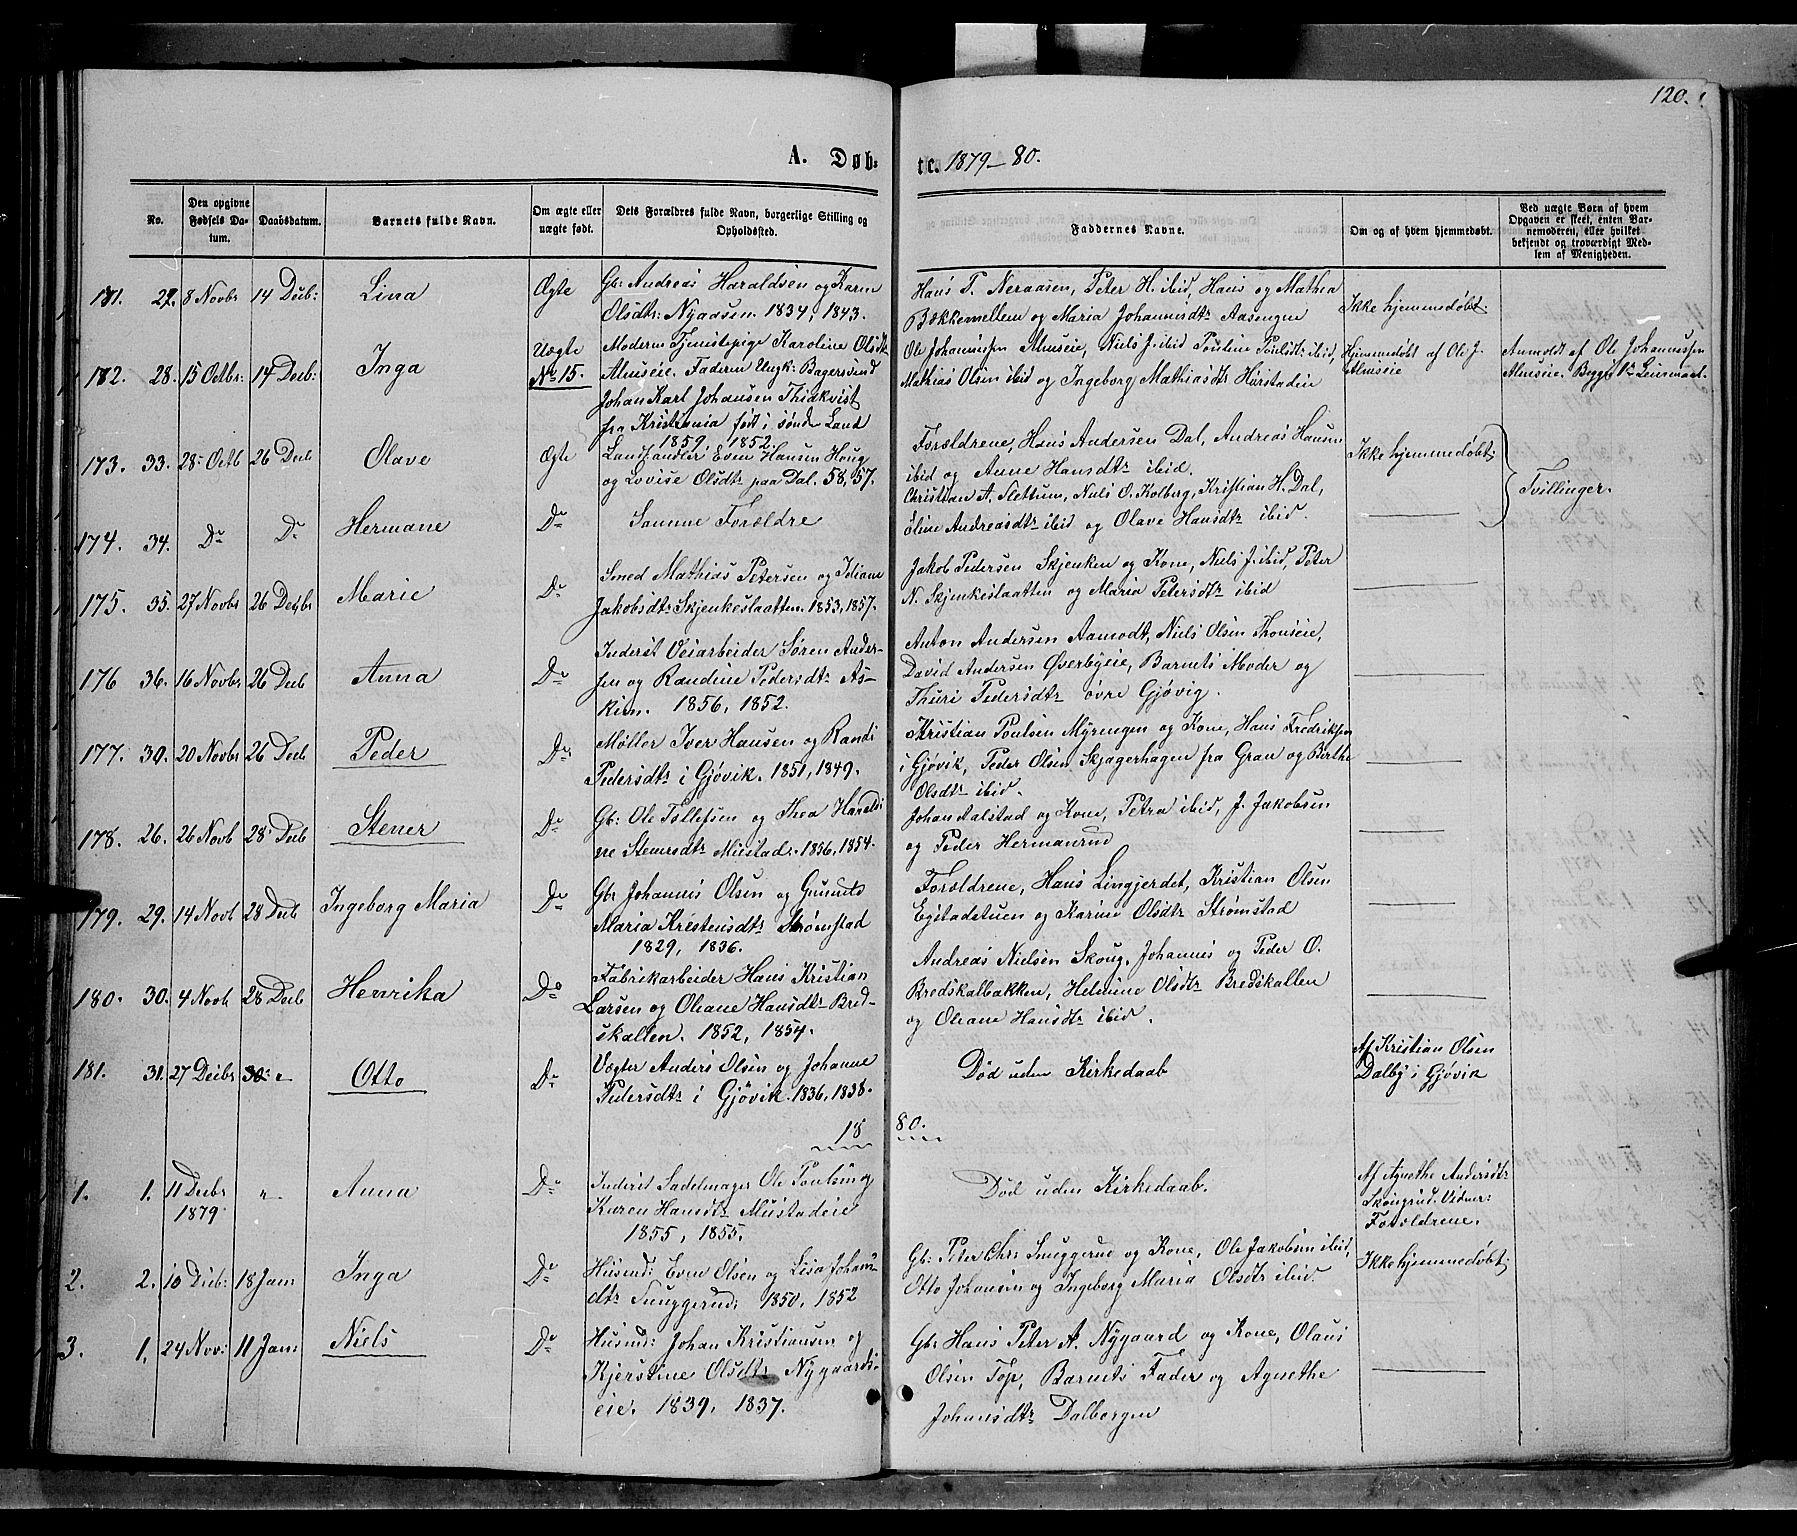 SAH, Vardal prestekontor, H/Ha/Hab/L0006: Klokkerbok nr. 6, 1869-1881, s. 120